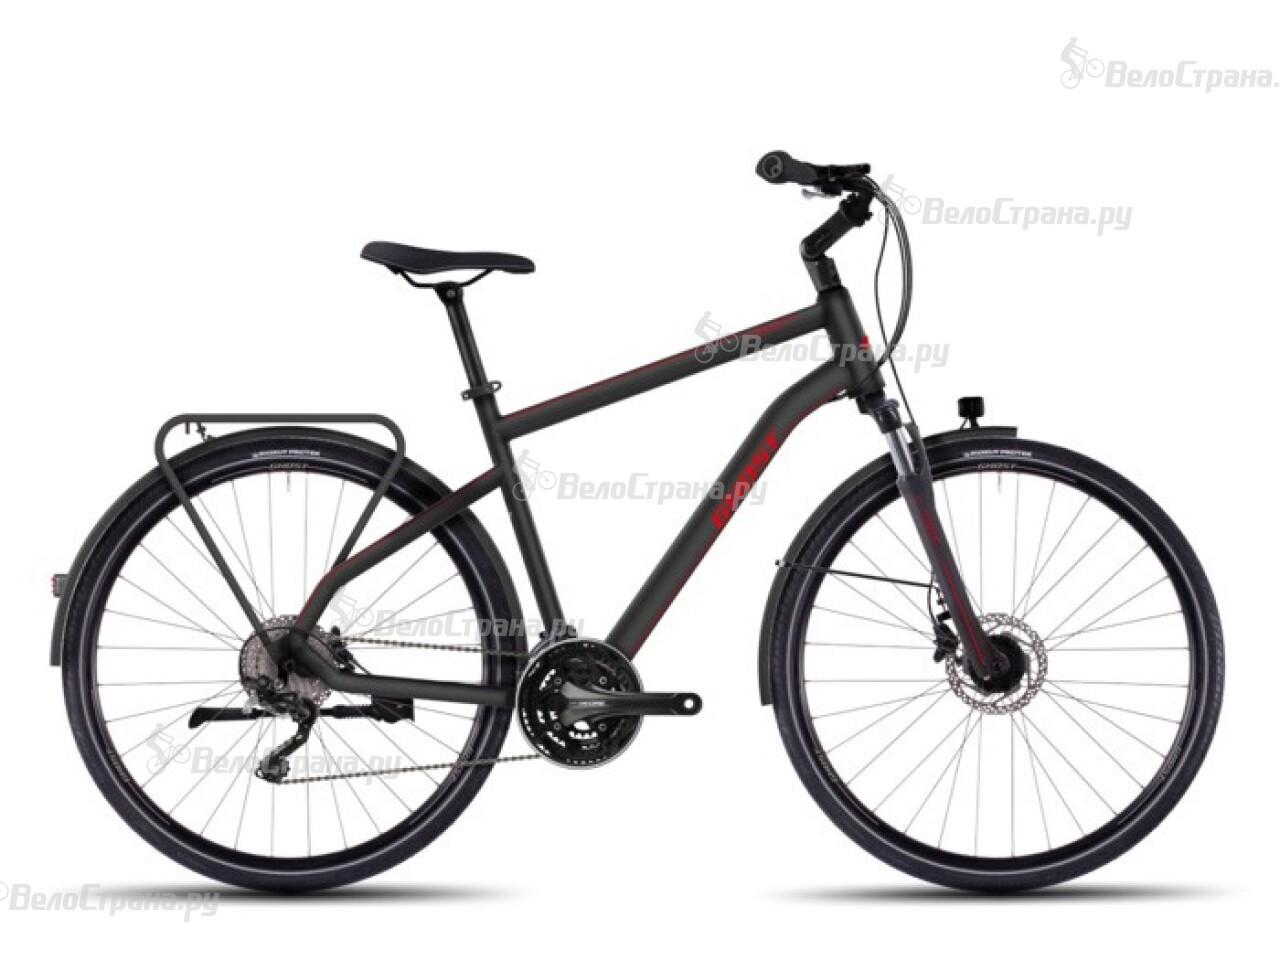 Велосипед Ghost SQUARE Trekking 6 (2016) цены онлайн